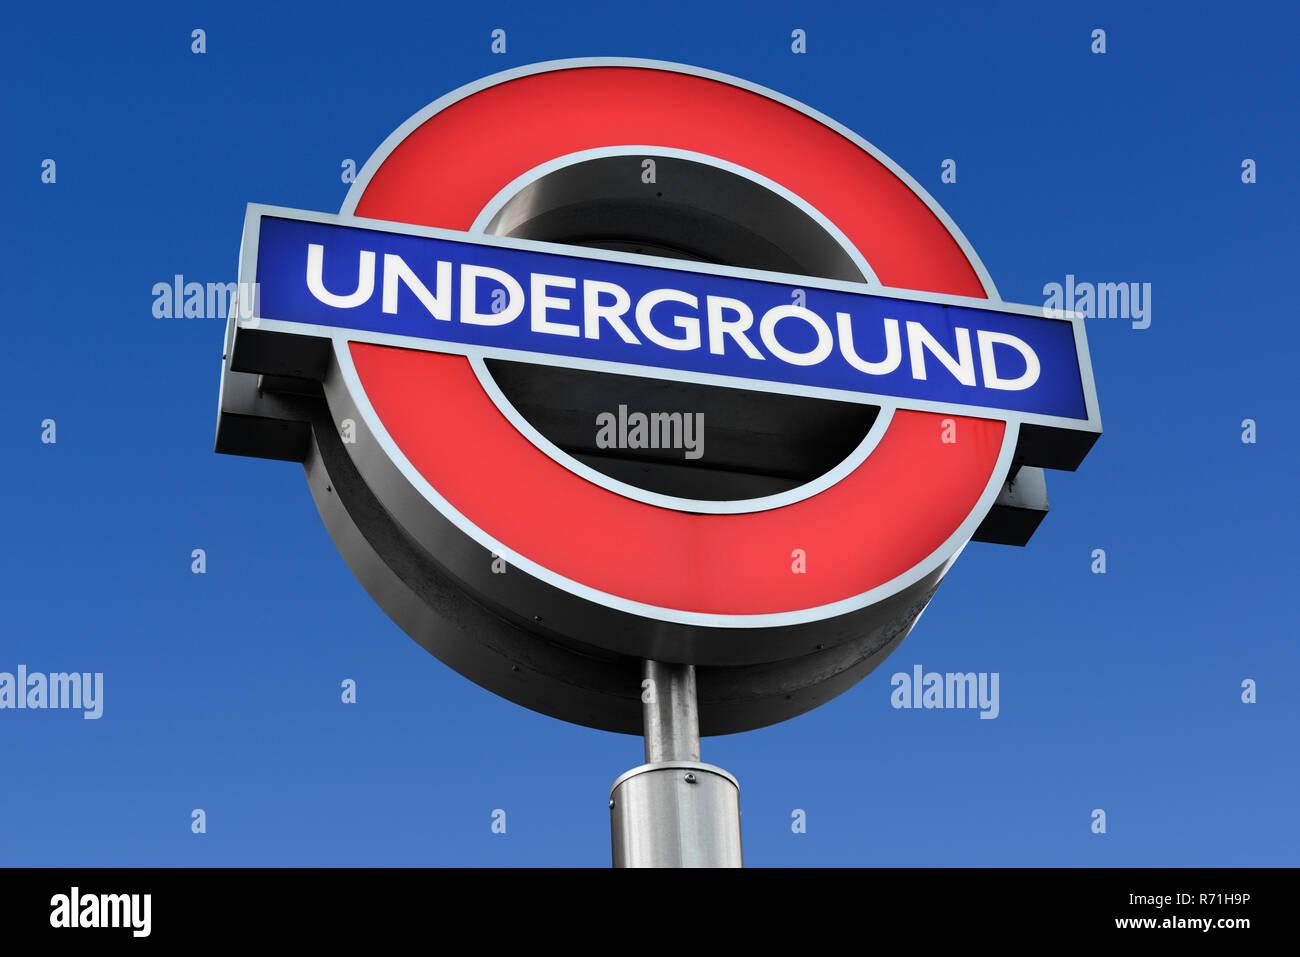 London Underground Sign - Stock Image